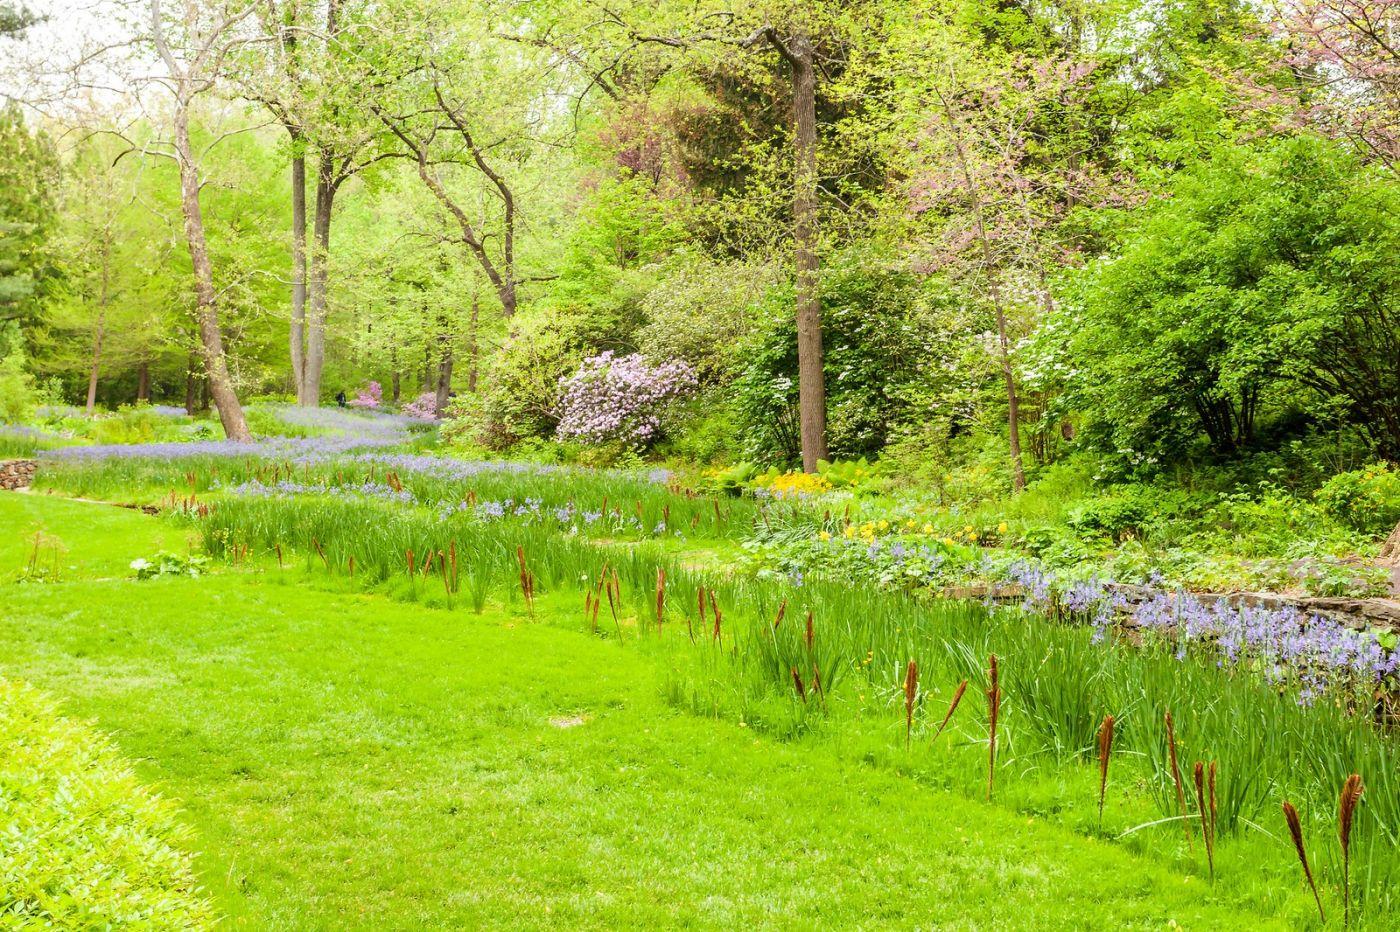 Chanticleer花园,融入自然_图1-15